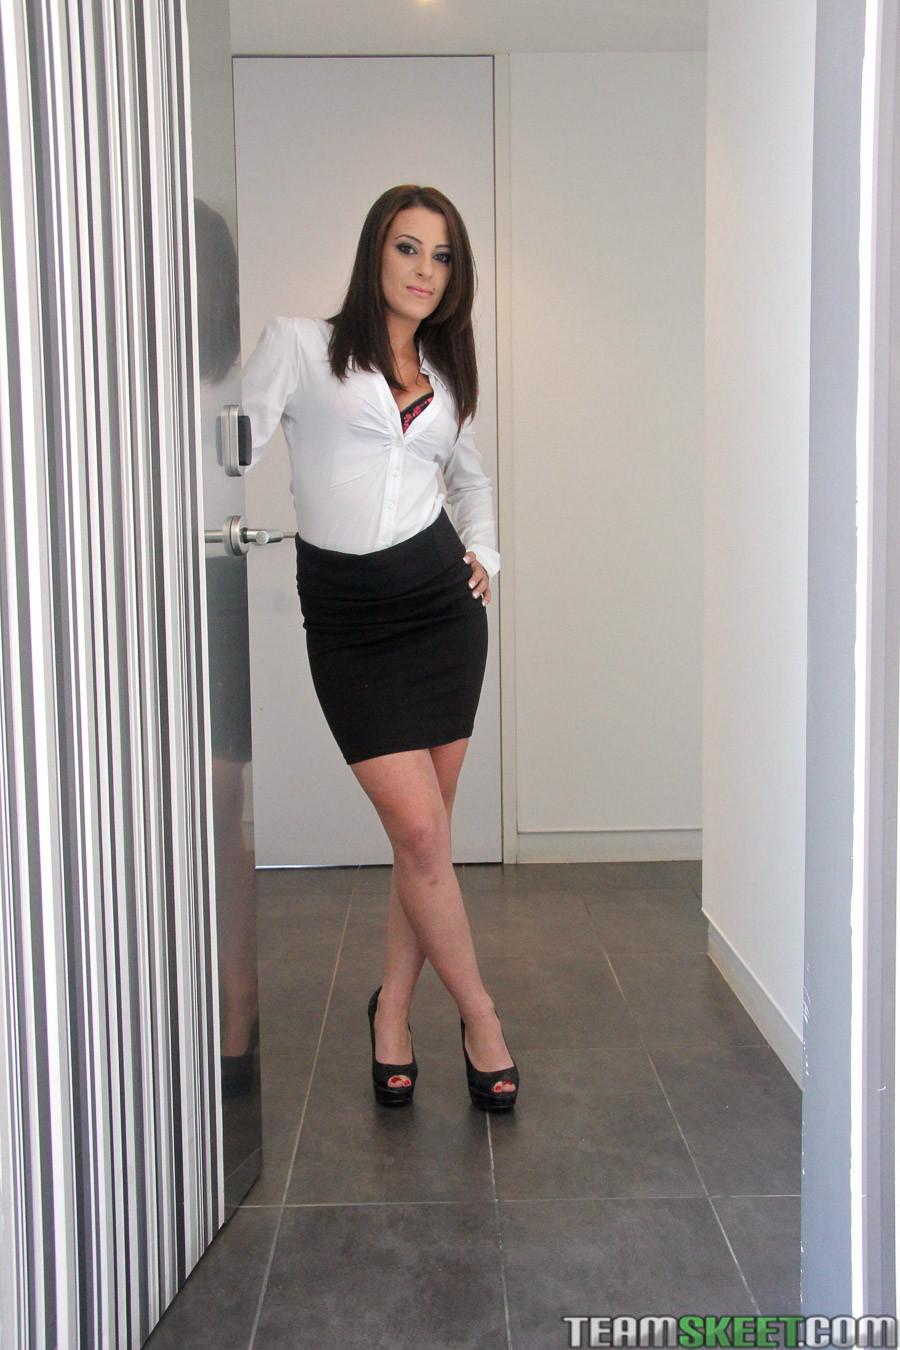 Yarissa Duran - Красивые ножки - Галерея № 3616173